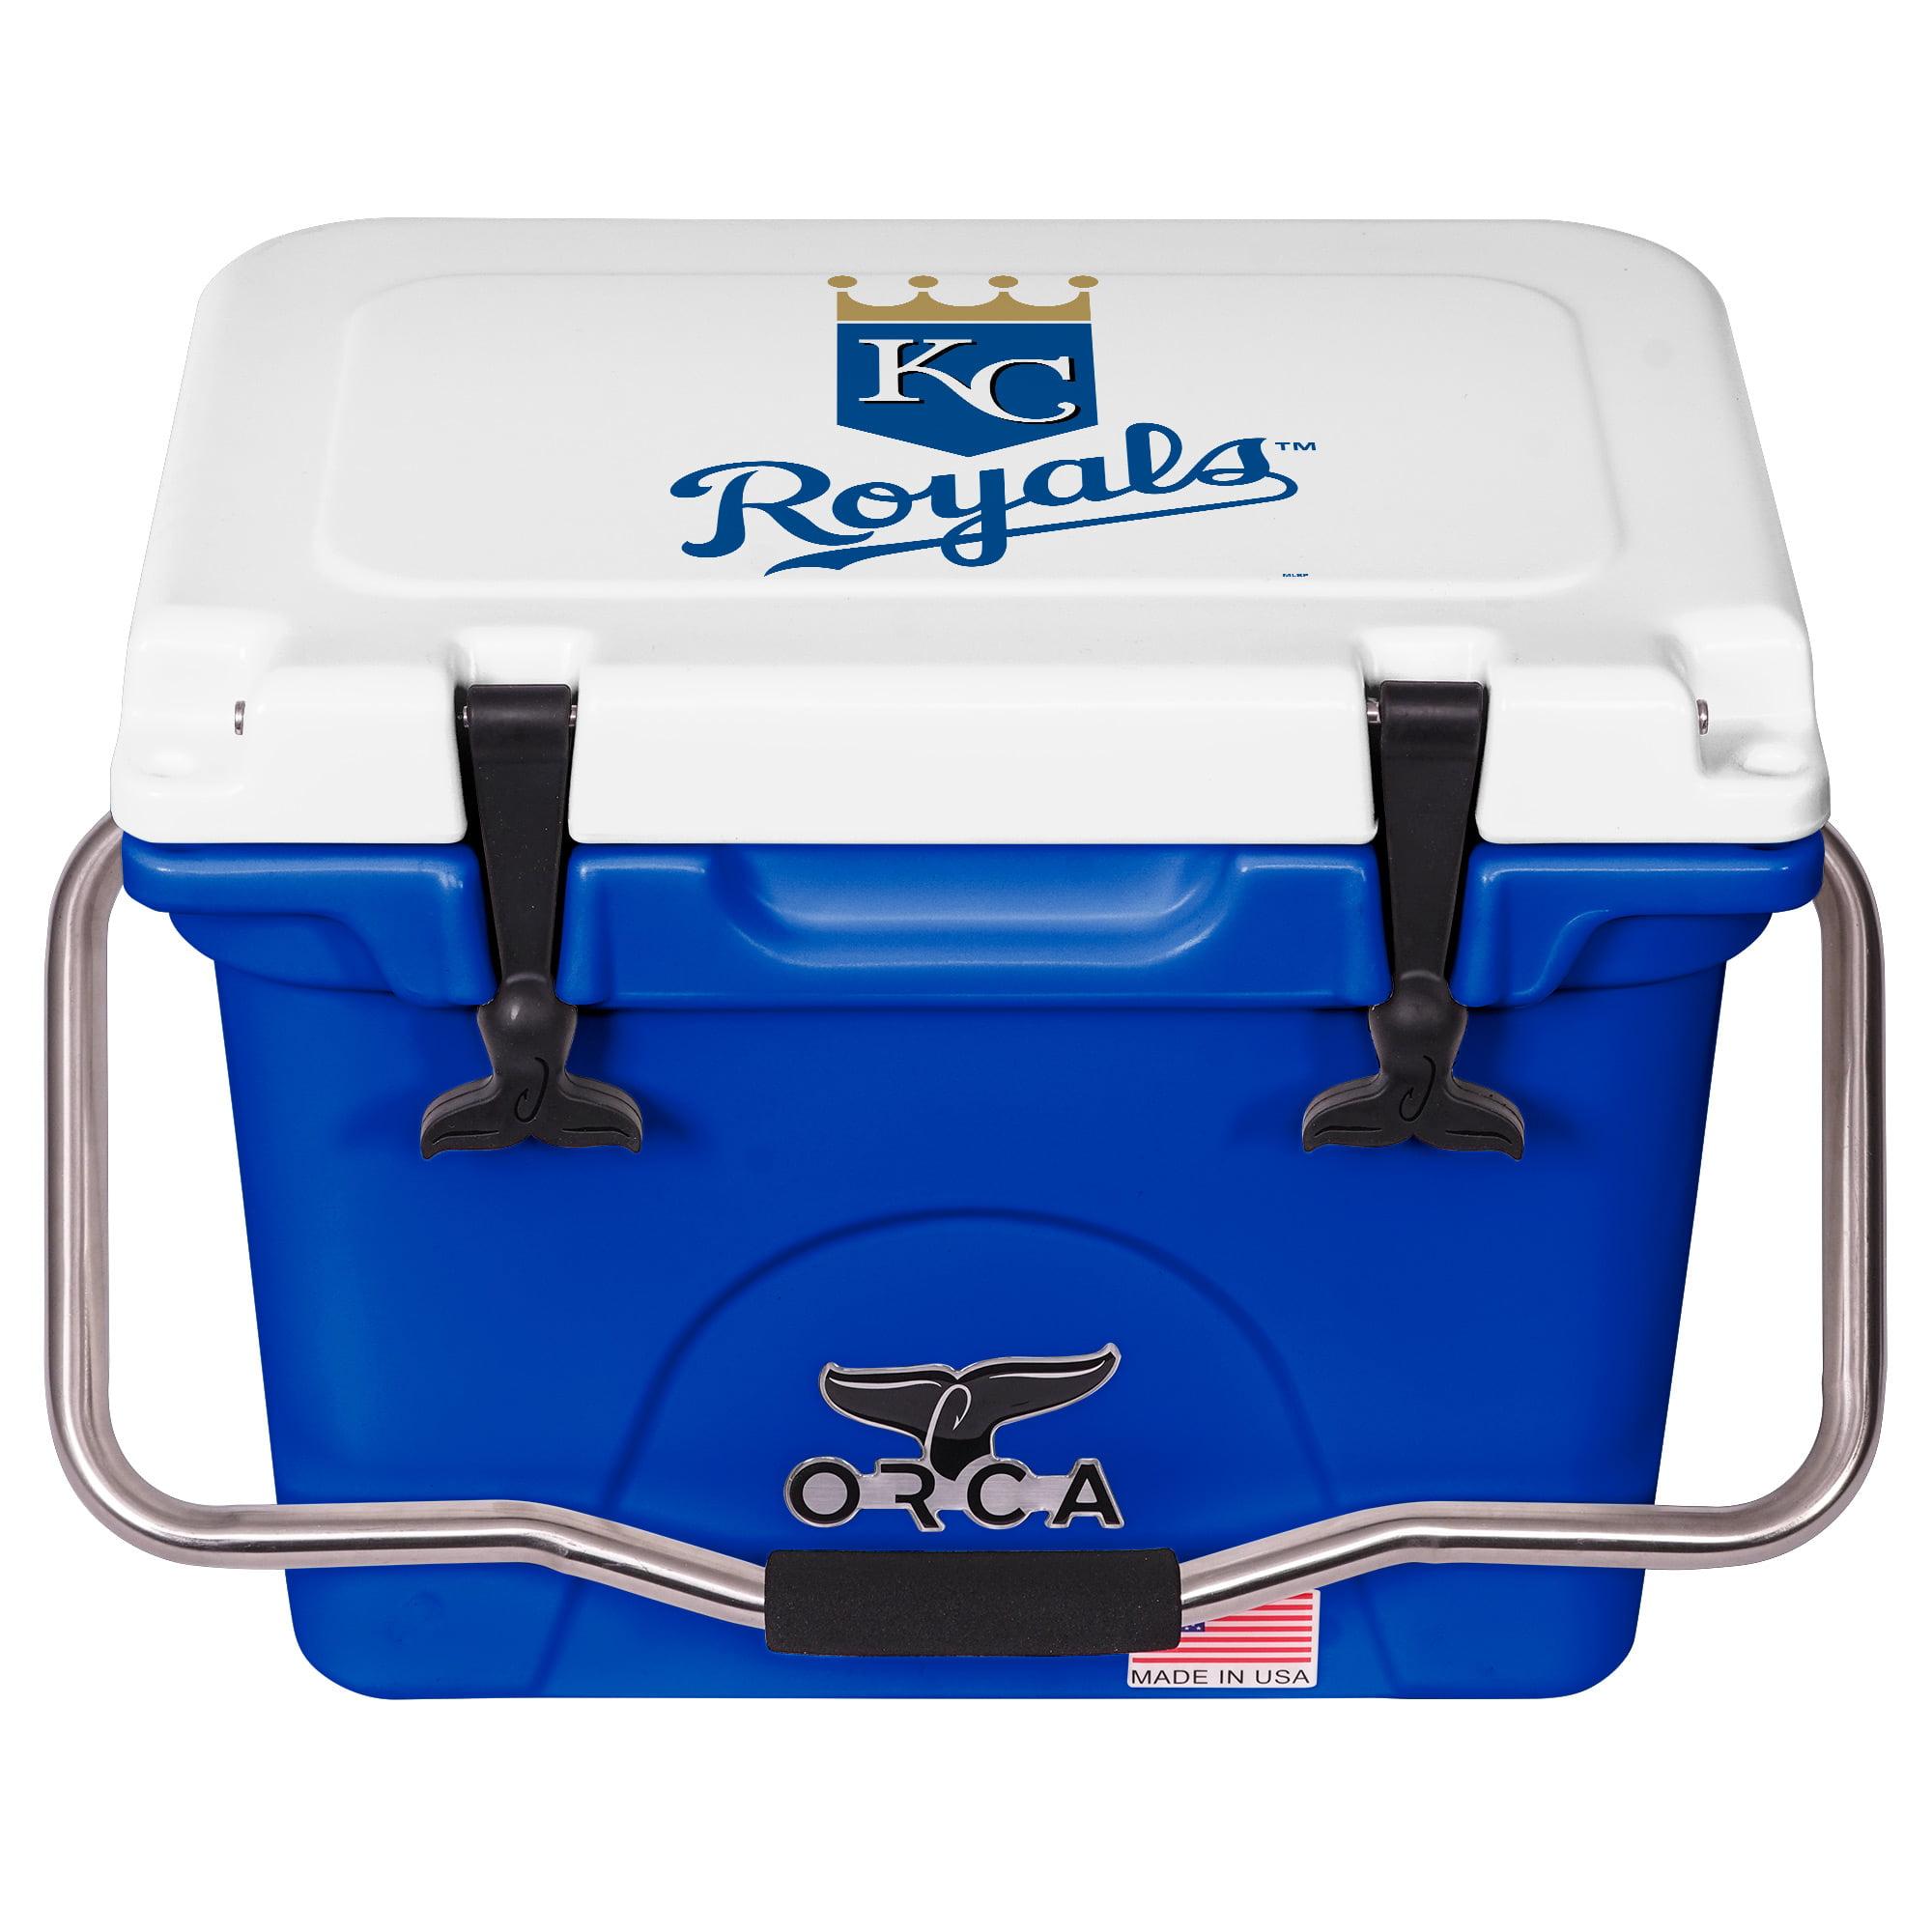 Kansas City Royals ORCA 20-Quart Hard-Sided Cooler - No Size